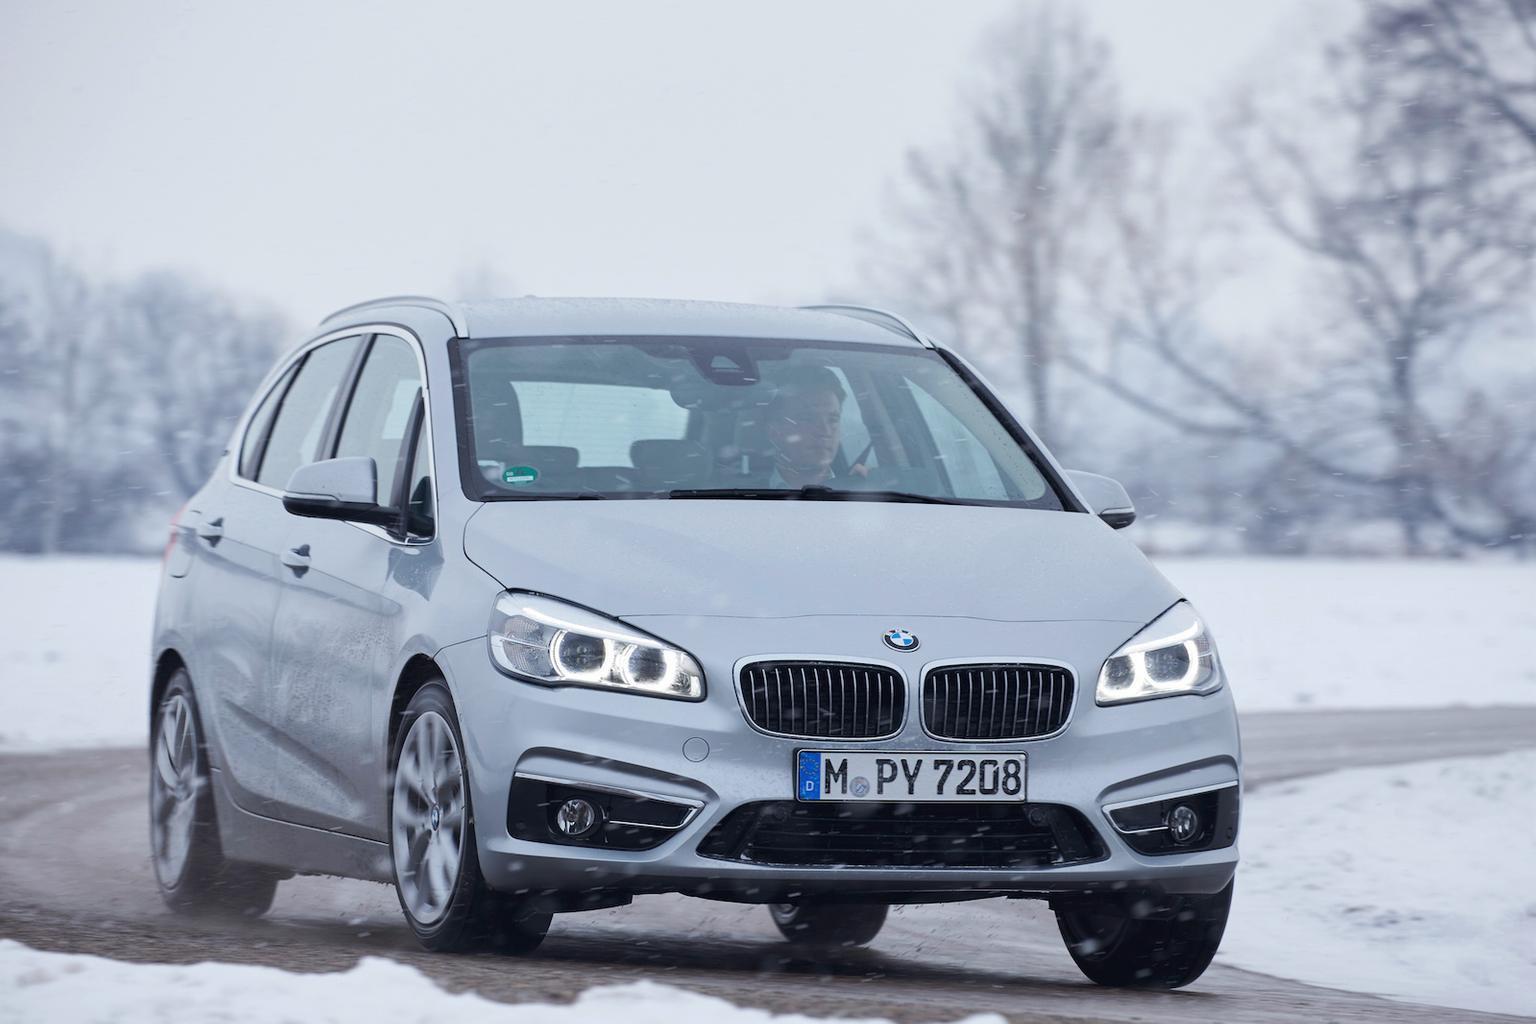 2016 BMW 2 Series Active Tourer 225xe review